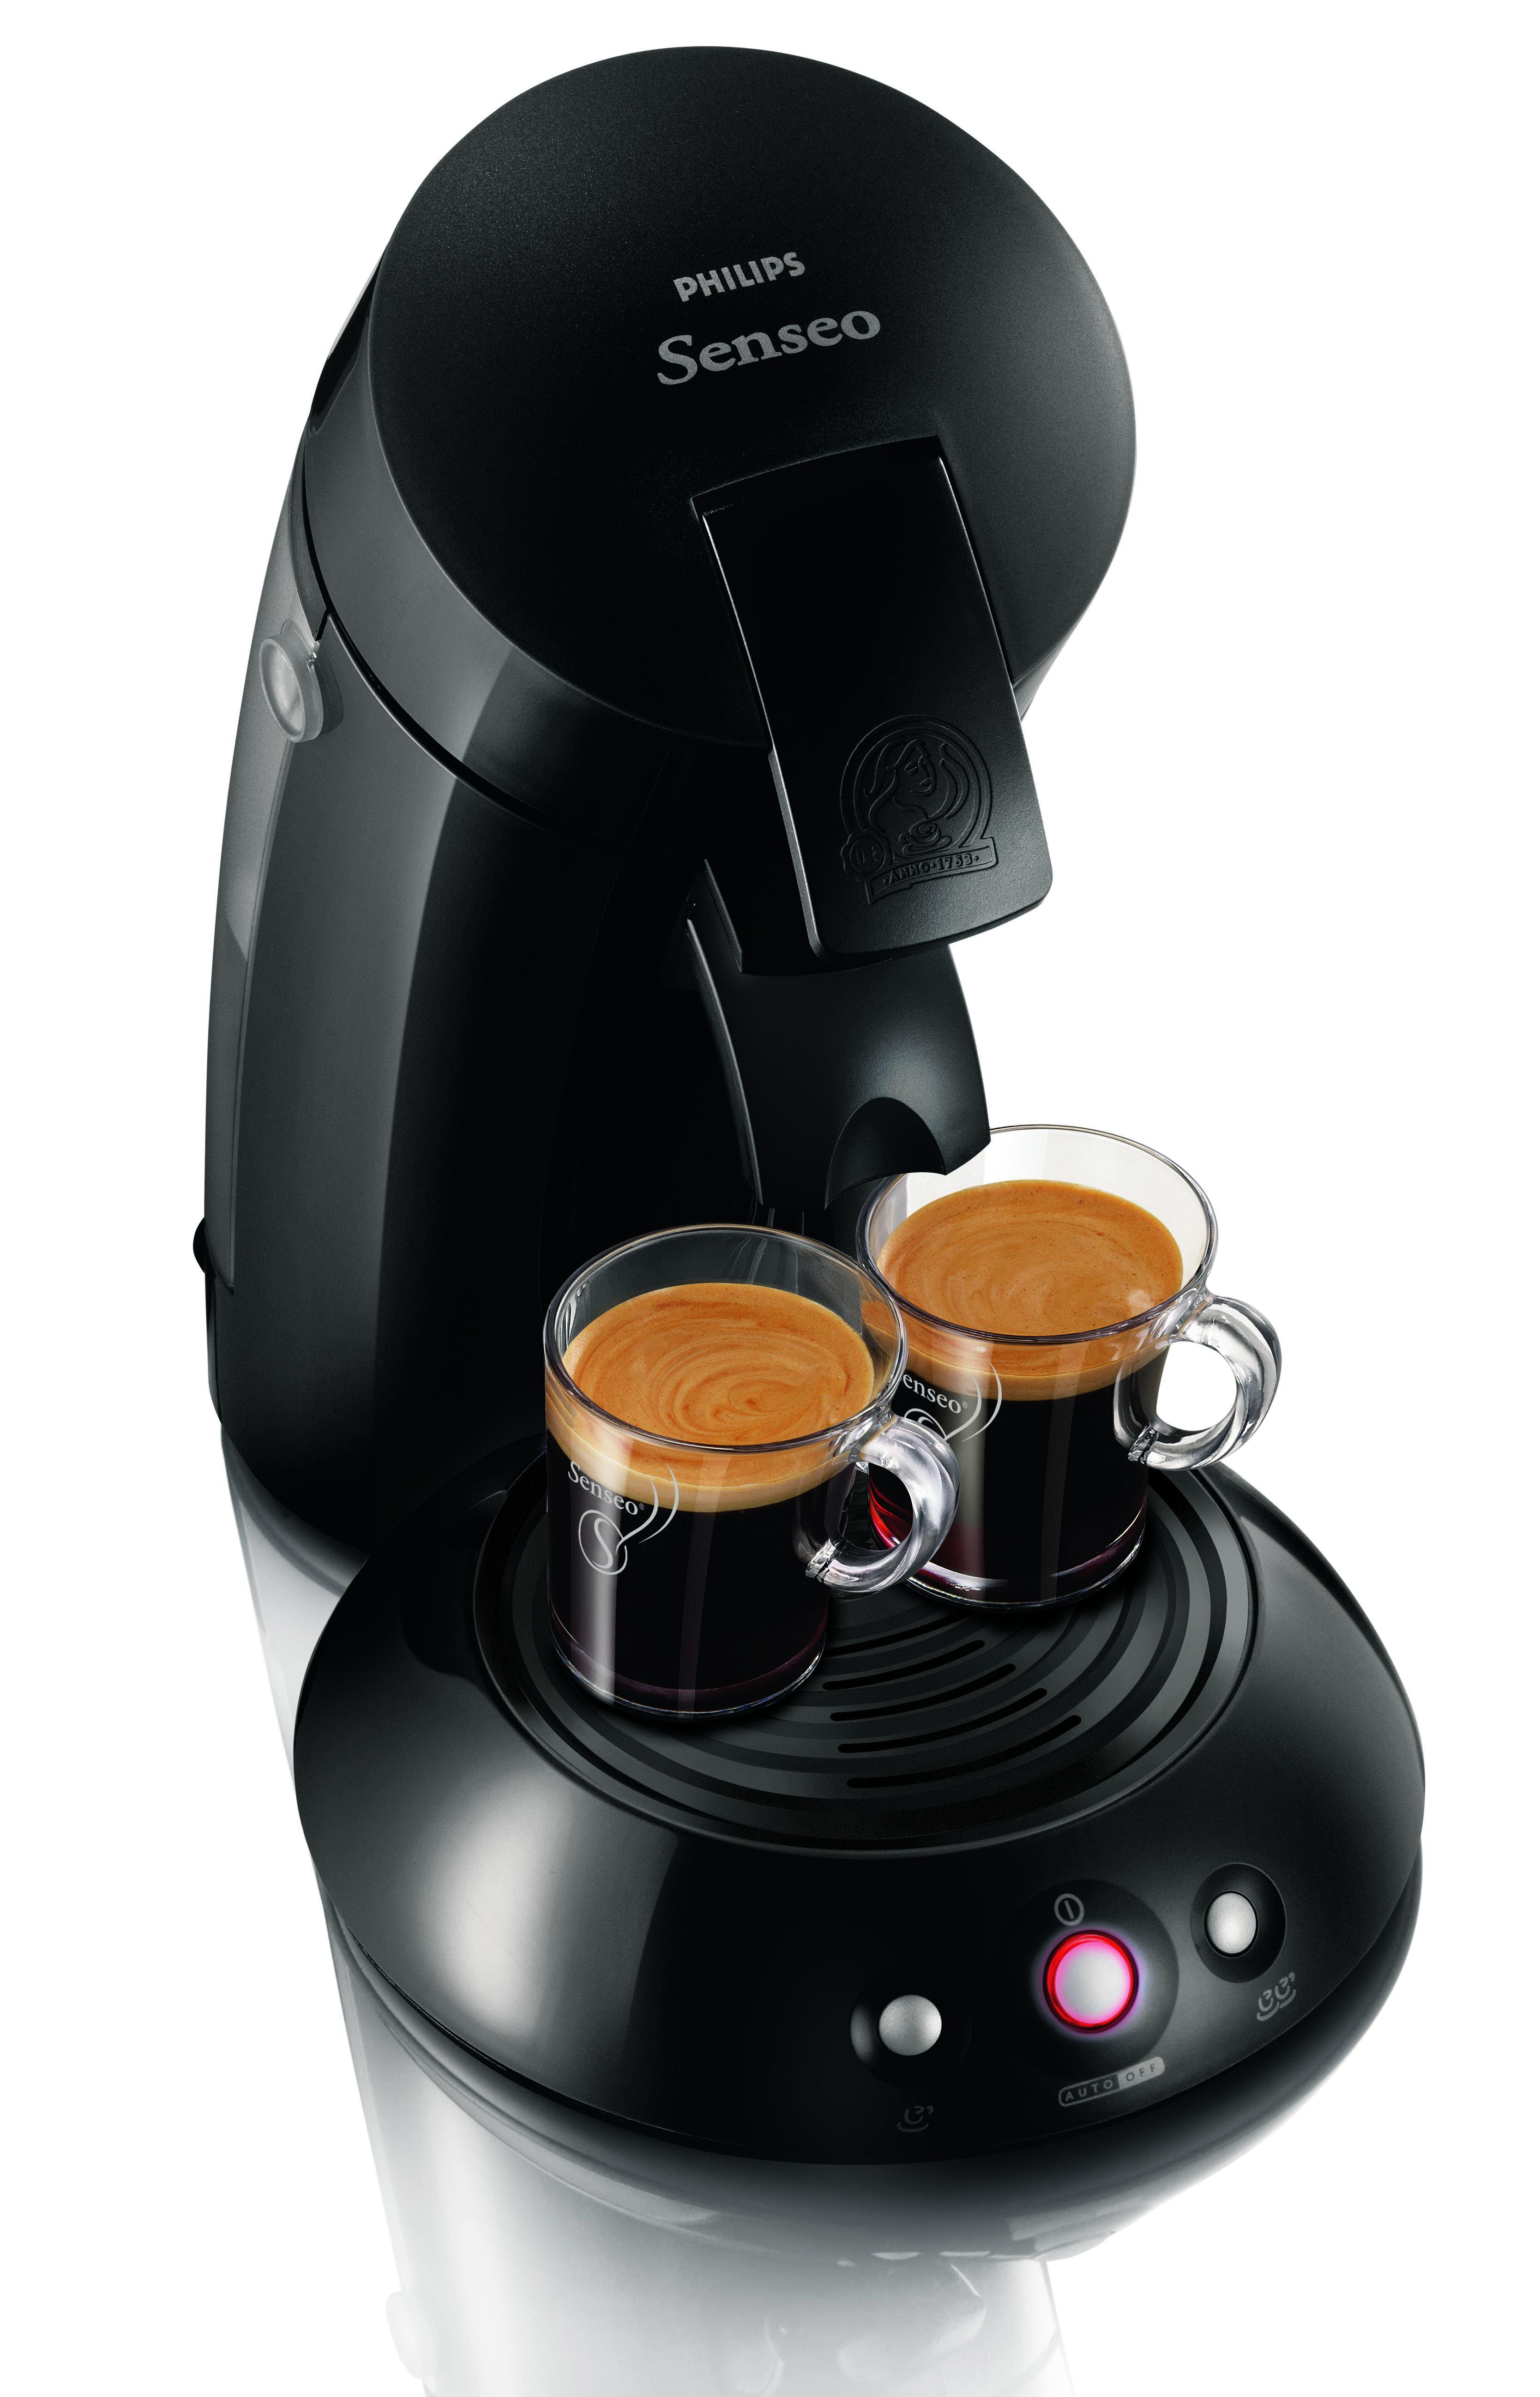 philips senseo hd 7810 60 kaffee padmaschine schwarz inkl 2 padhalter pads ebay. Black Bedroom Furniture Sets. Home Design Ideas